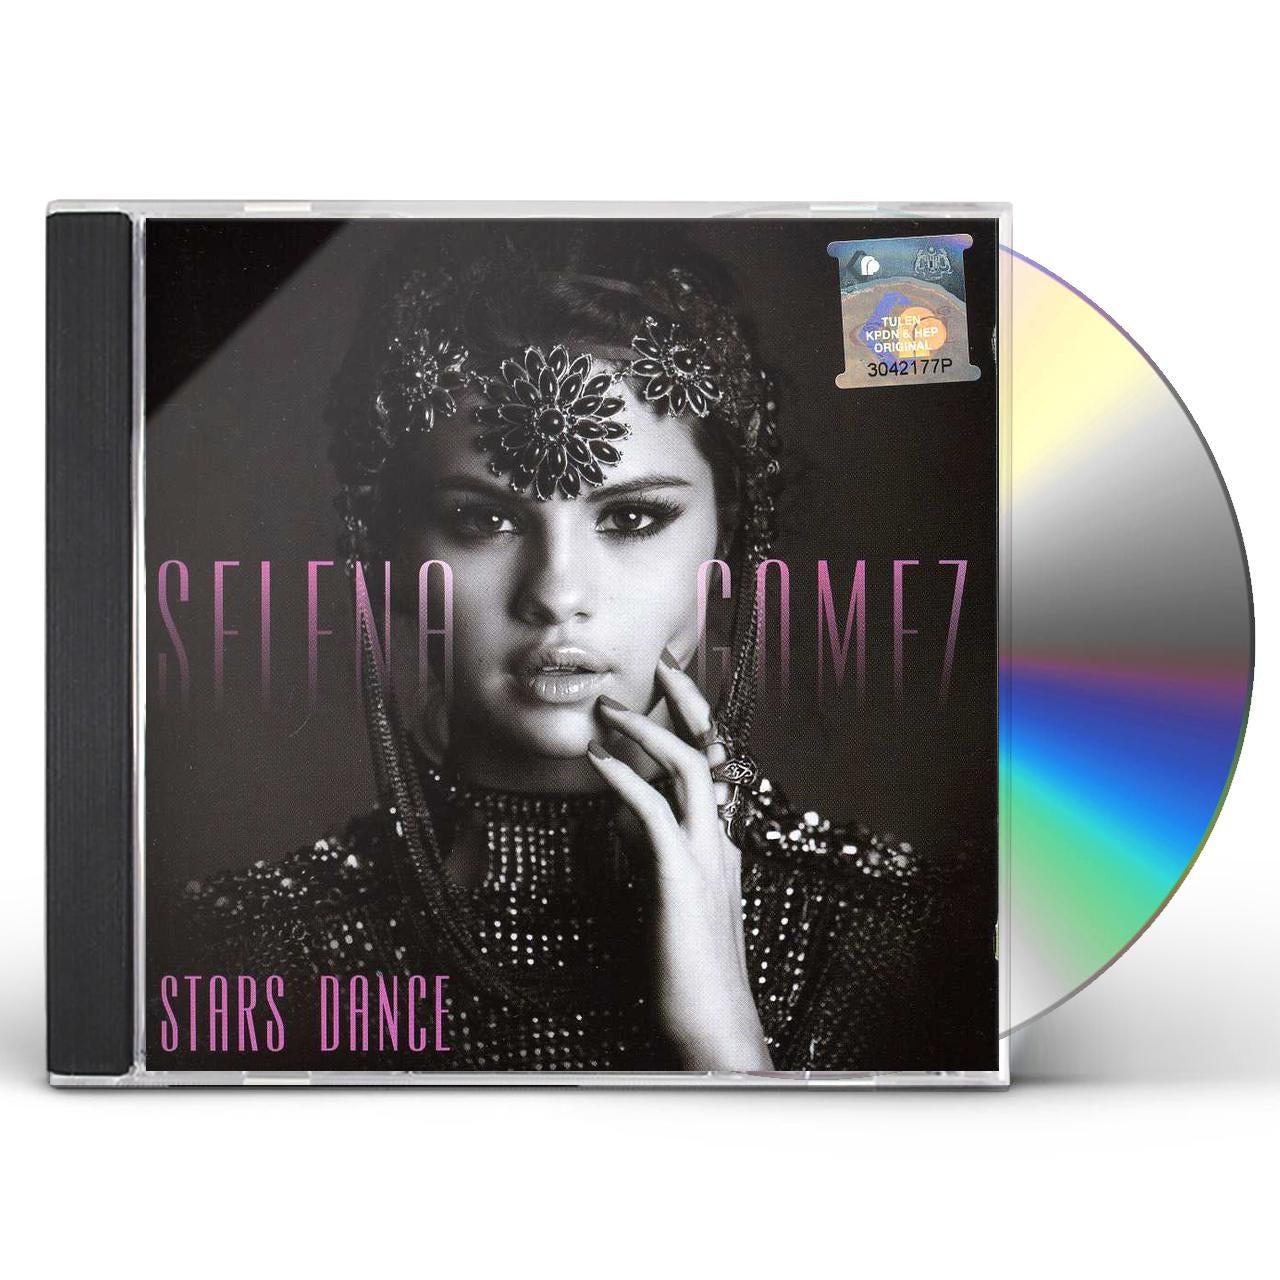 Selena Gomez - CD Stars Dance (Deluxe Edition)